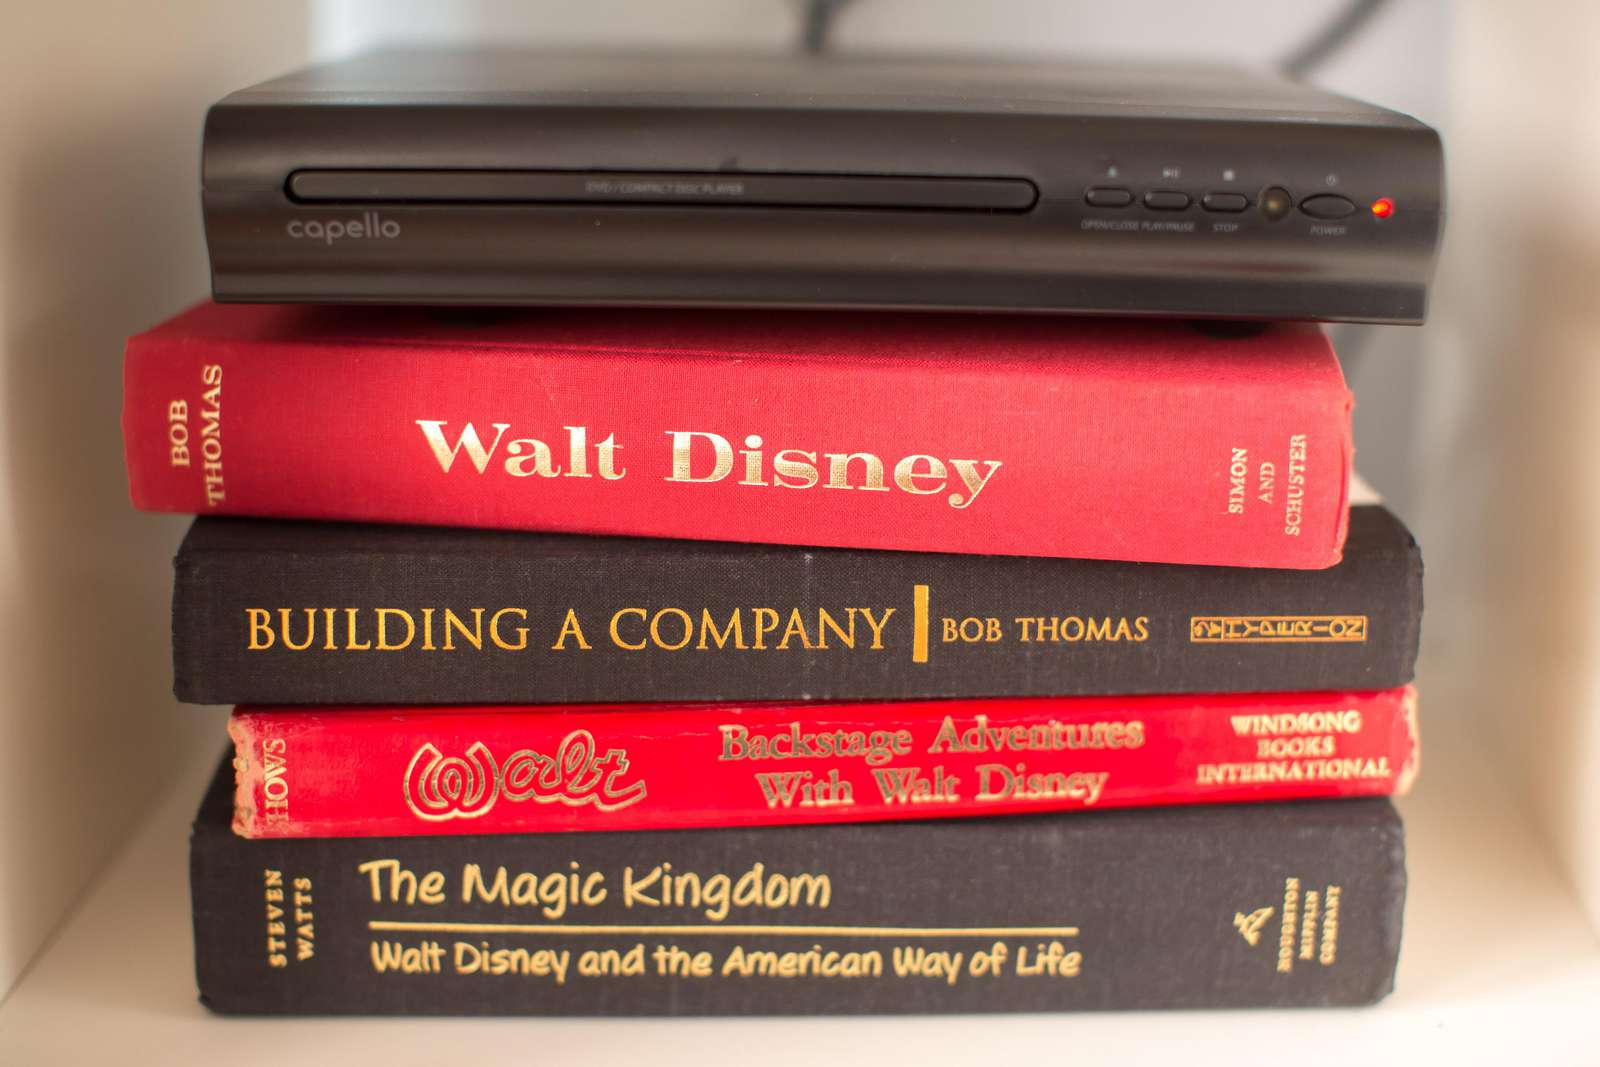 Disney decor and books